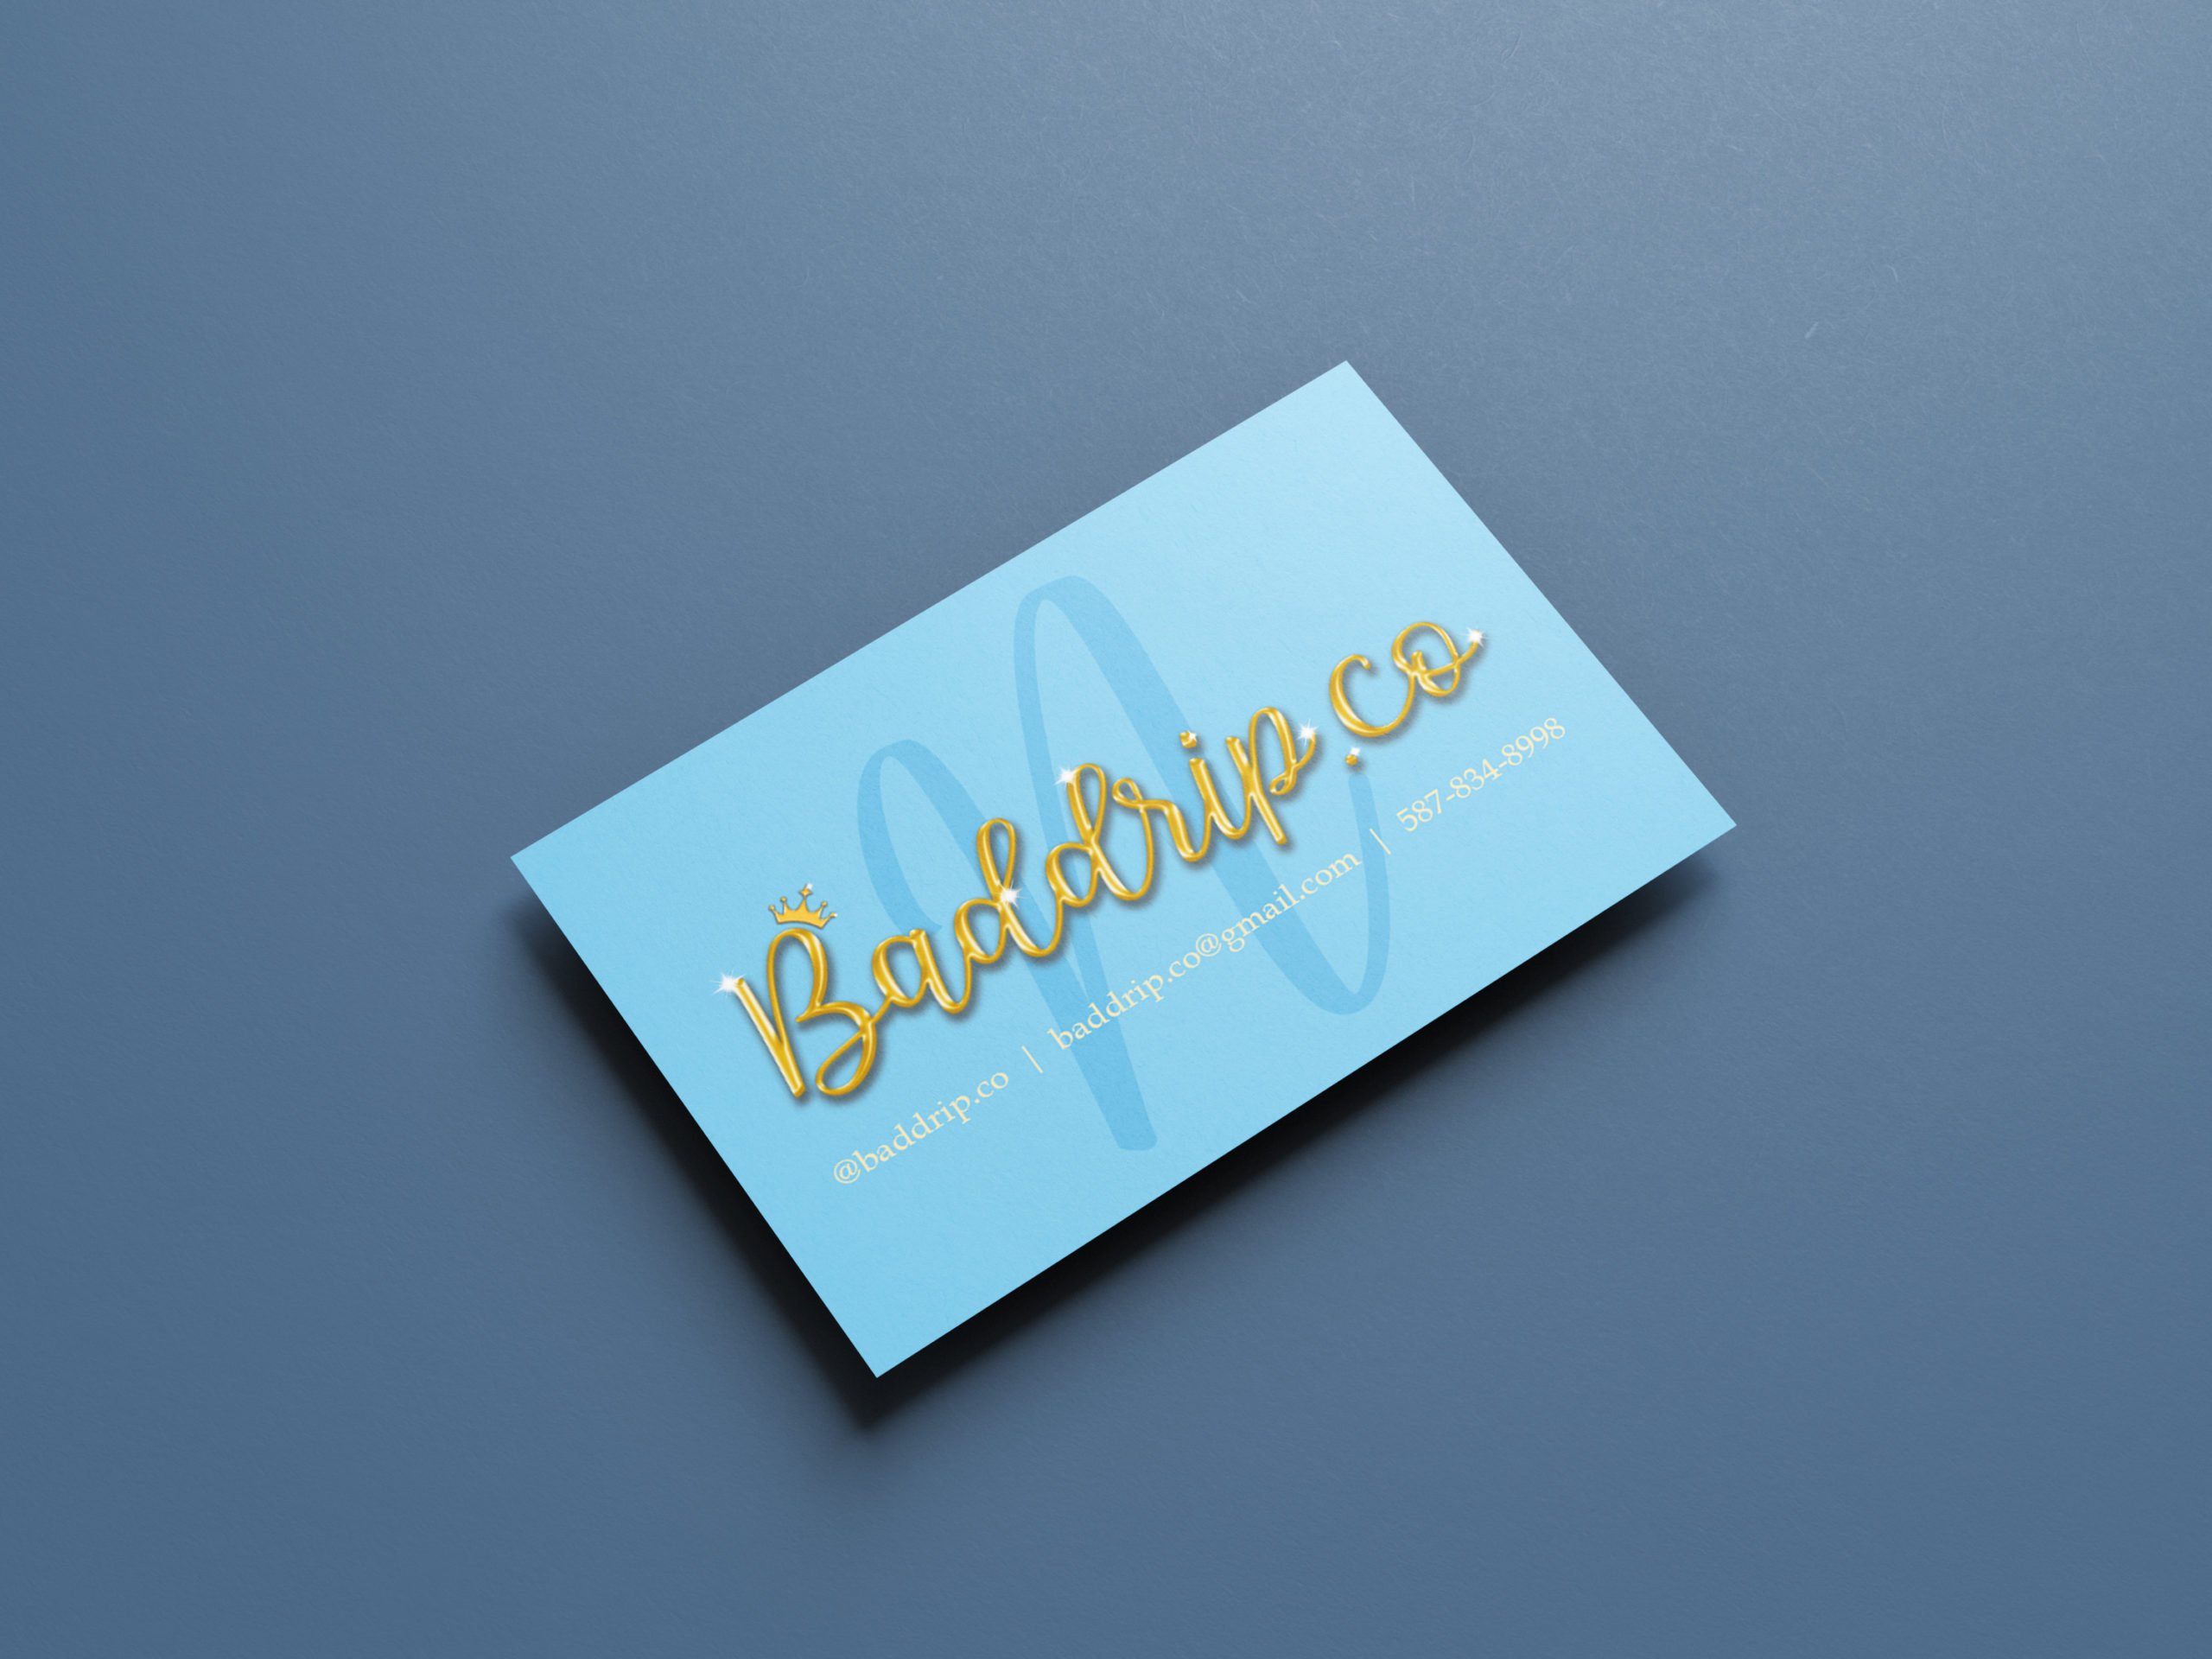 Badrip.co